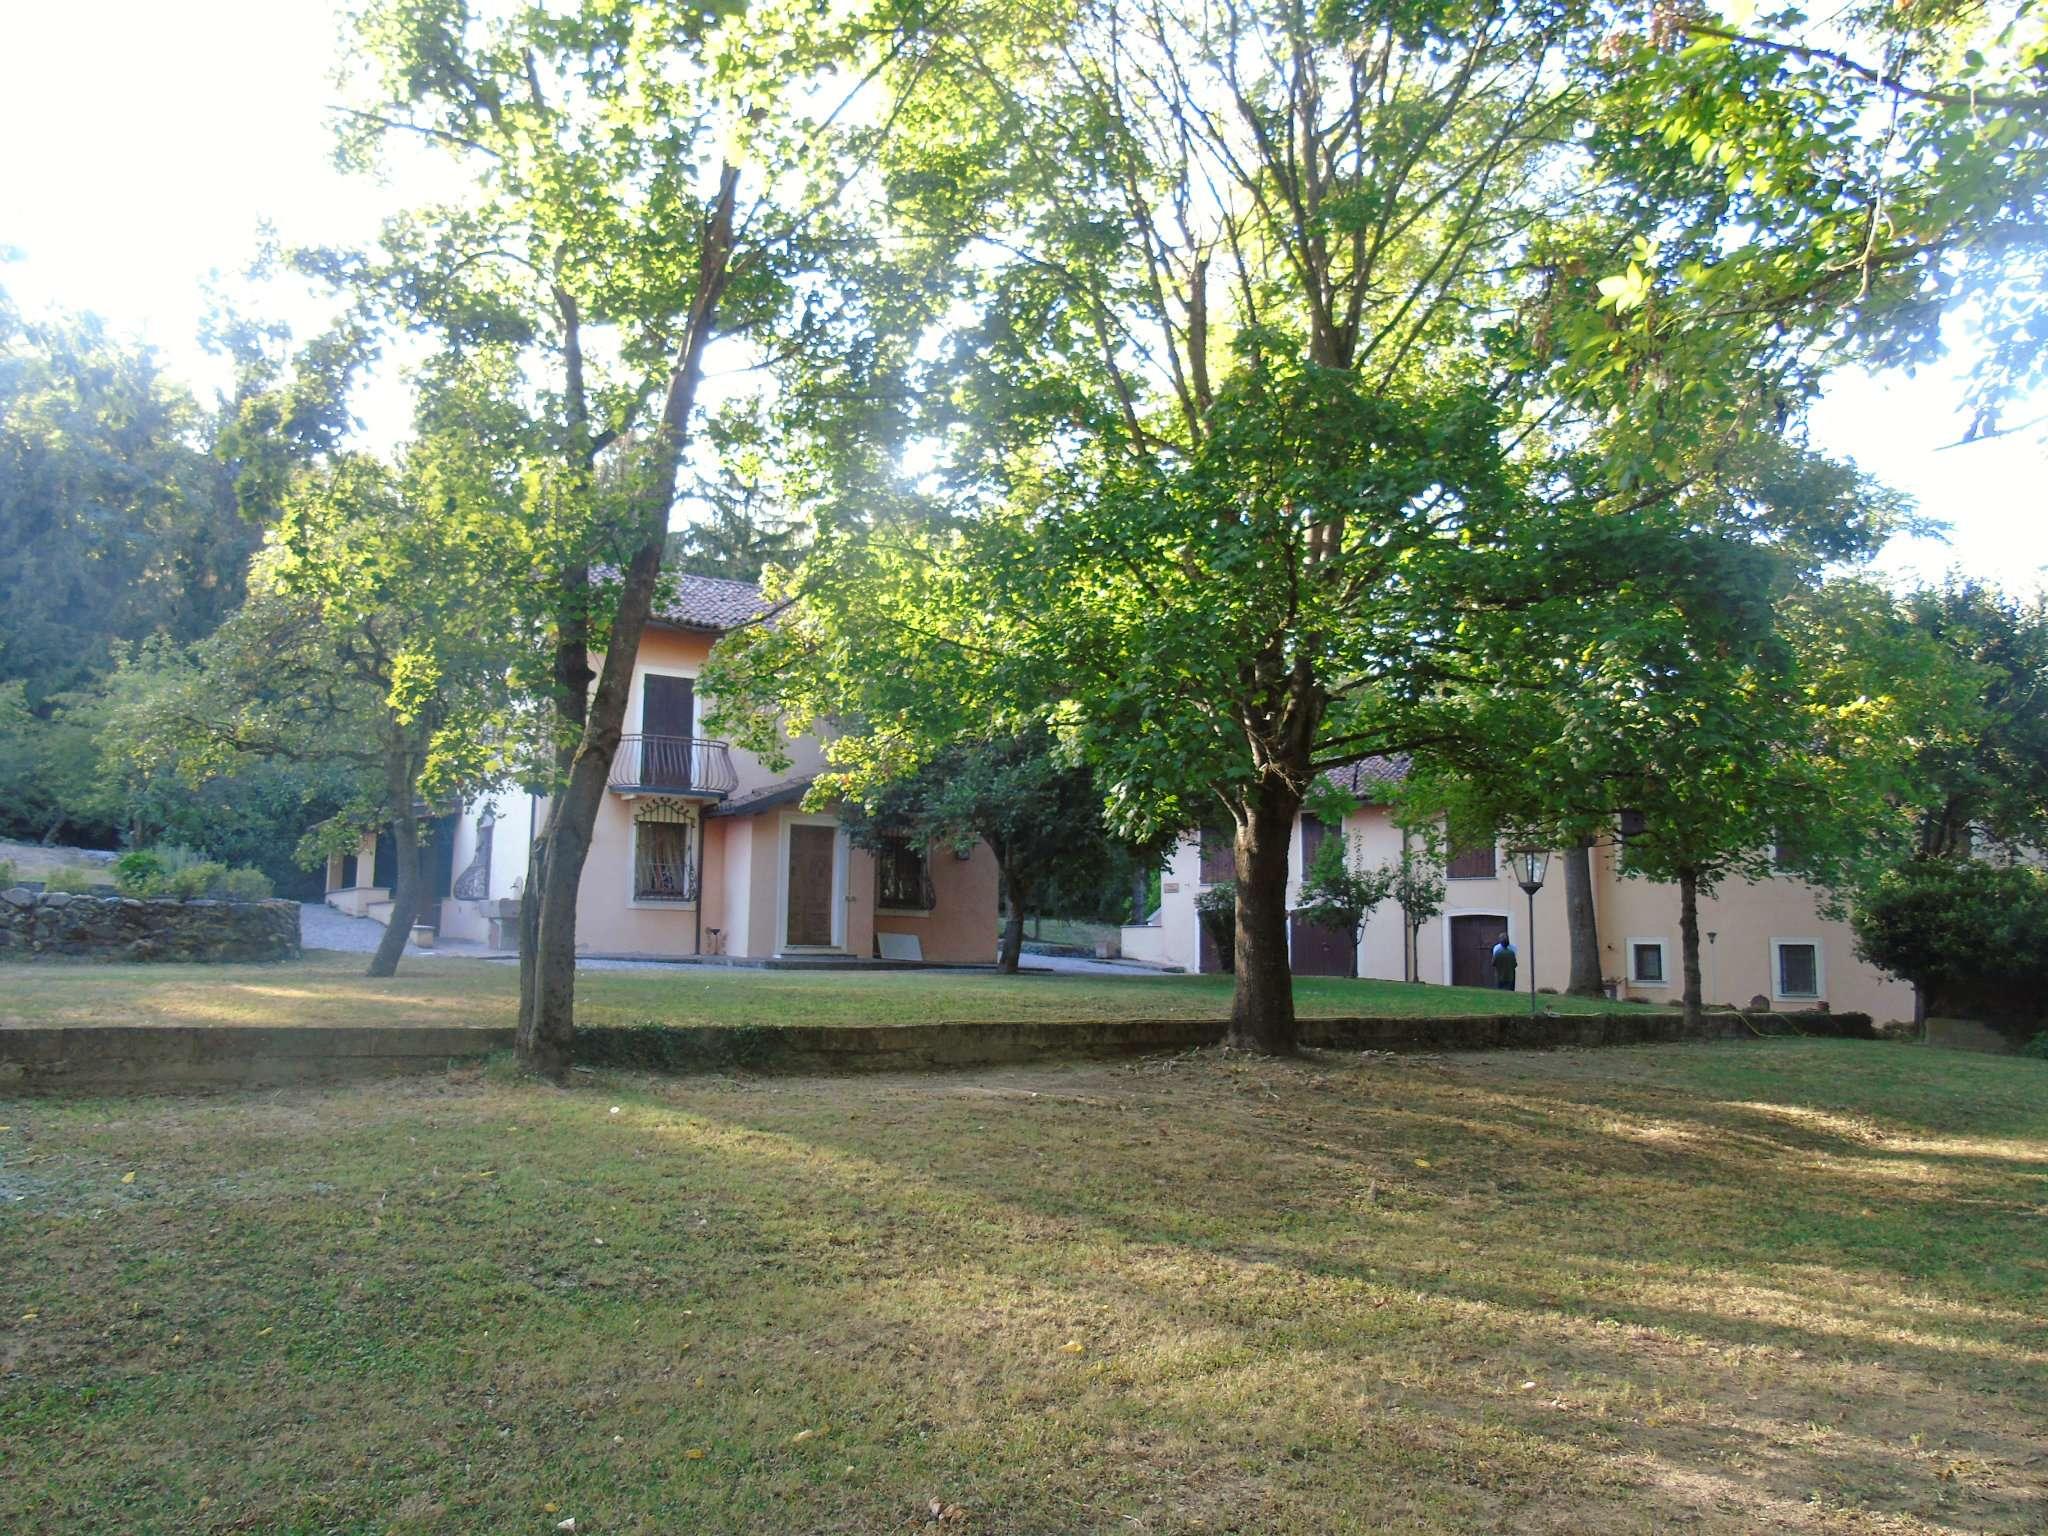 Villa in Vendita a Gavi: 5 locali, 465 mq